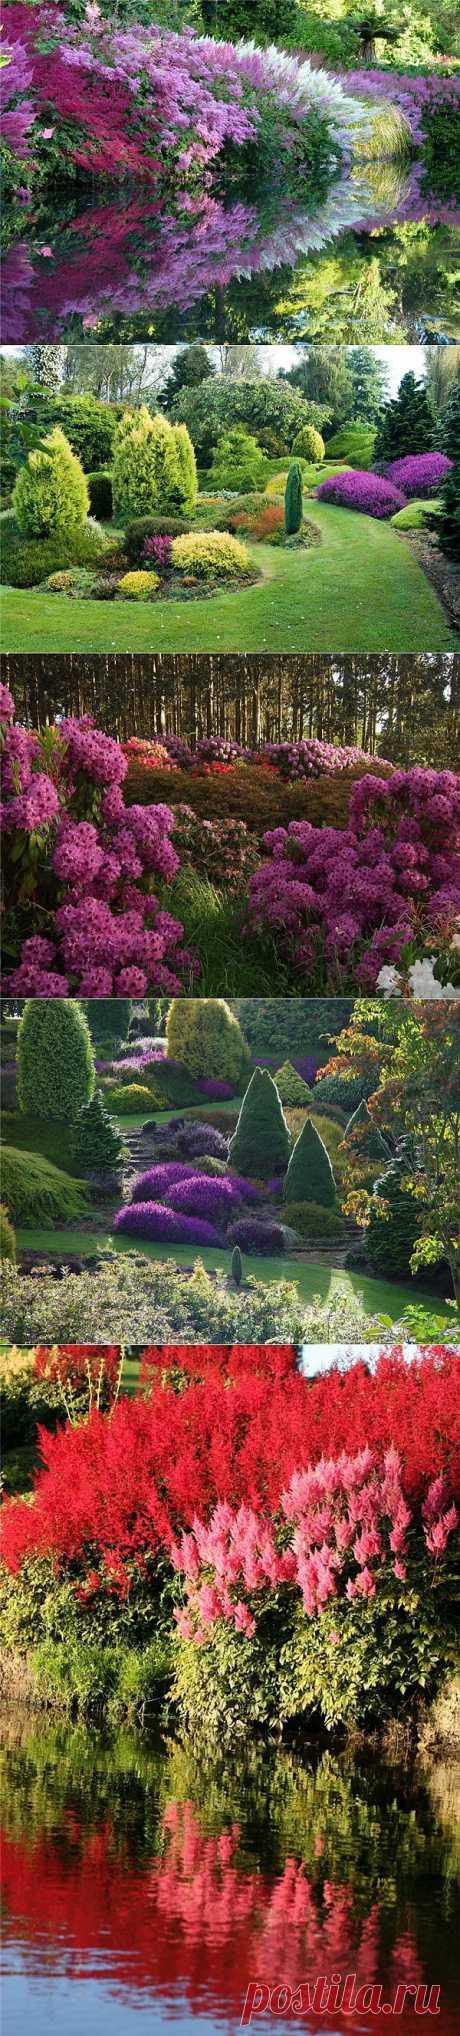 Сад долины реки Клена / Maple Glen garden   Kayrosblog.ru